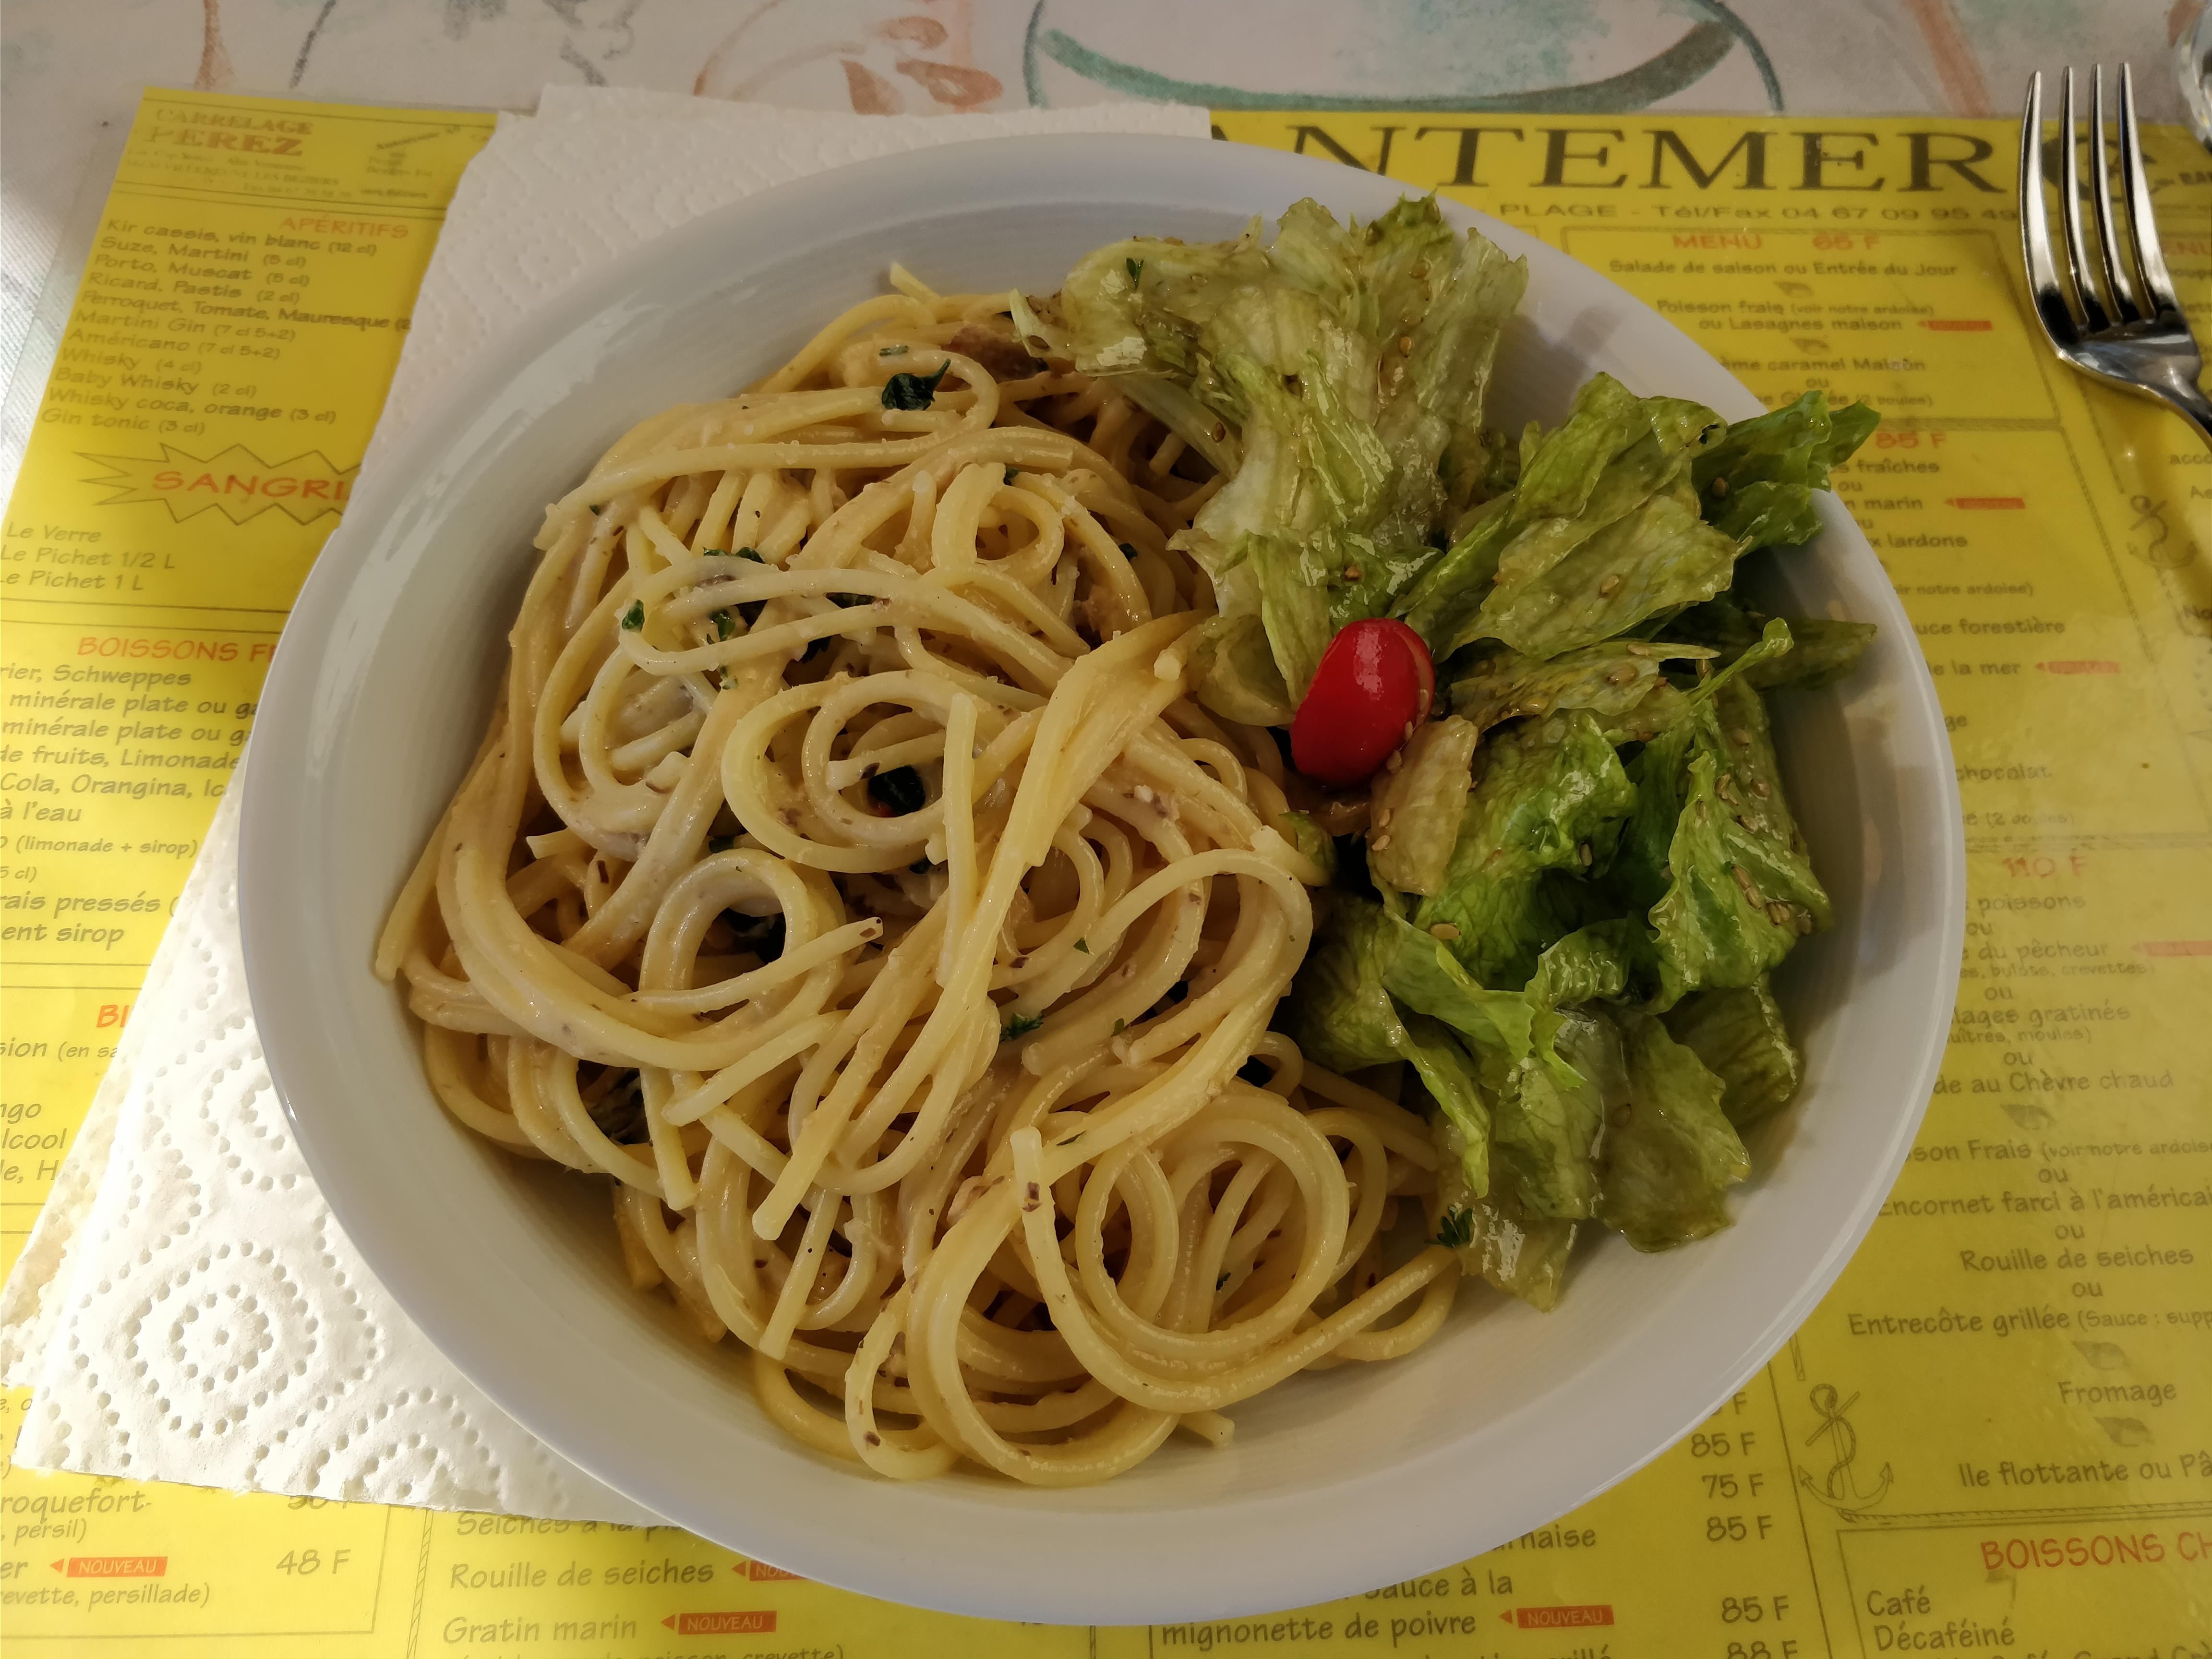 http://foodloader.net/nico_2017-10-15_spaghetti-mit-sardinen-sahne-sauce.jpg